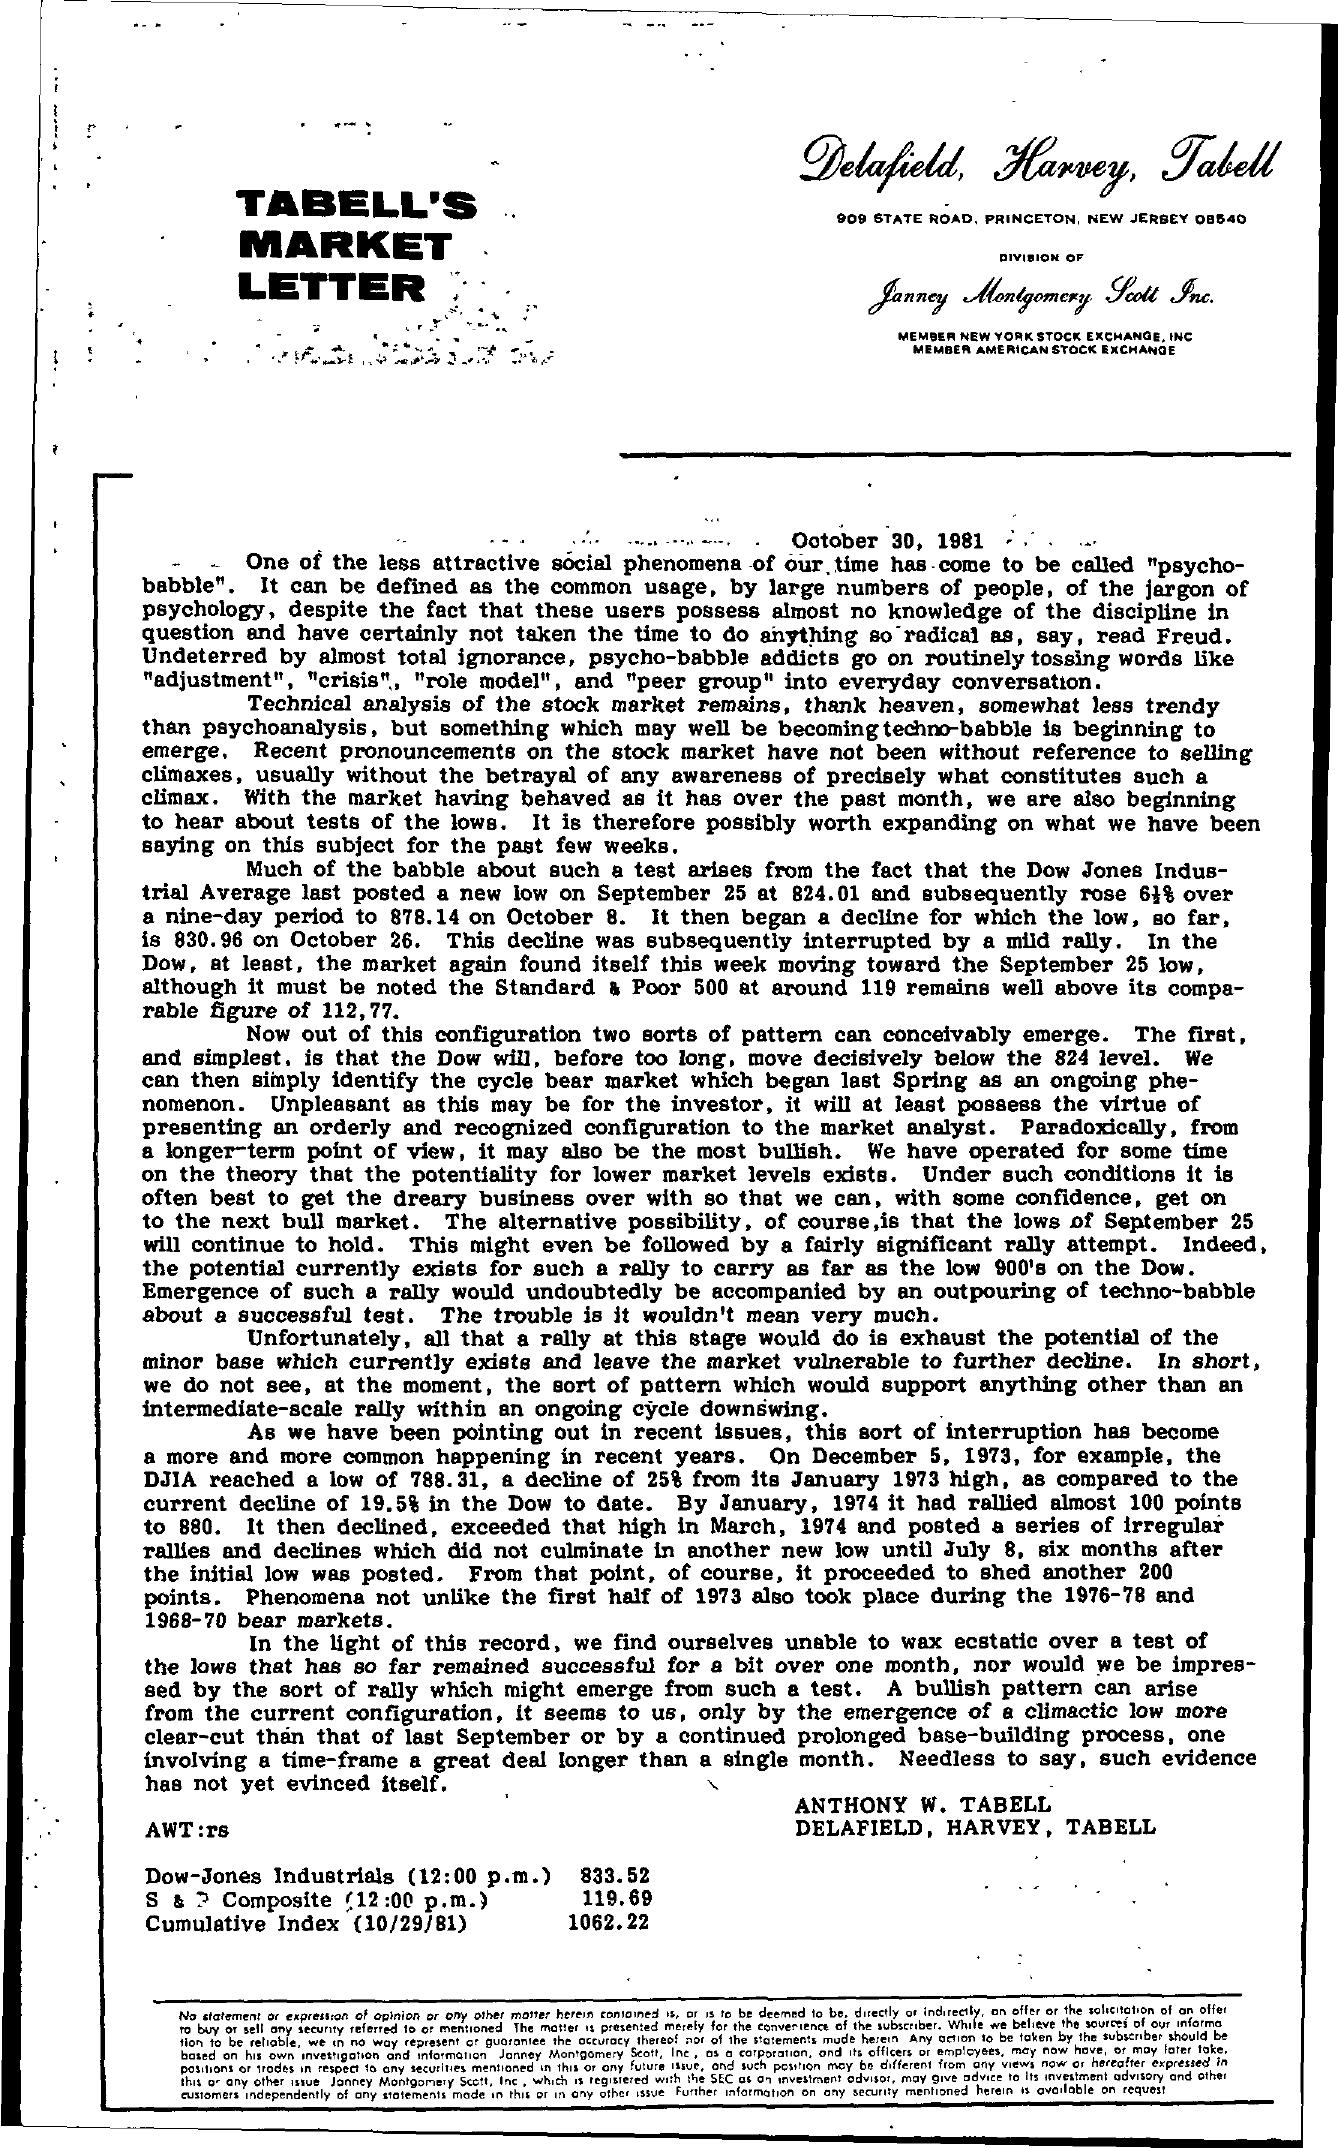 Tabell's Market Letter - October 30, 1981